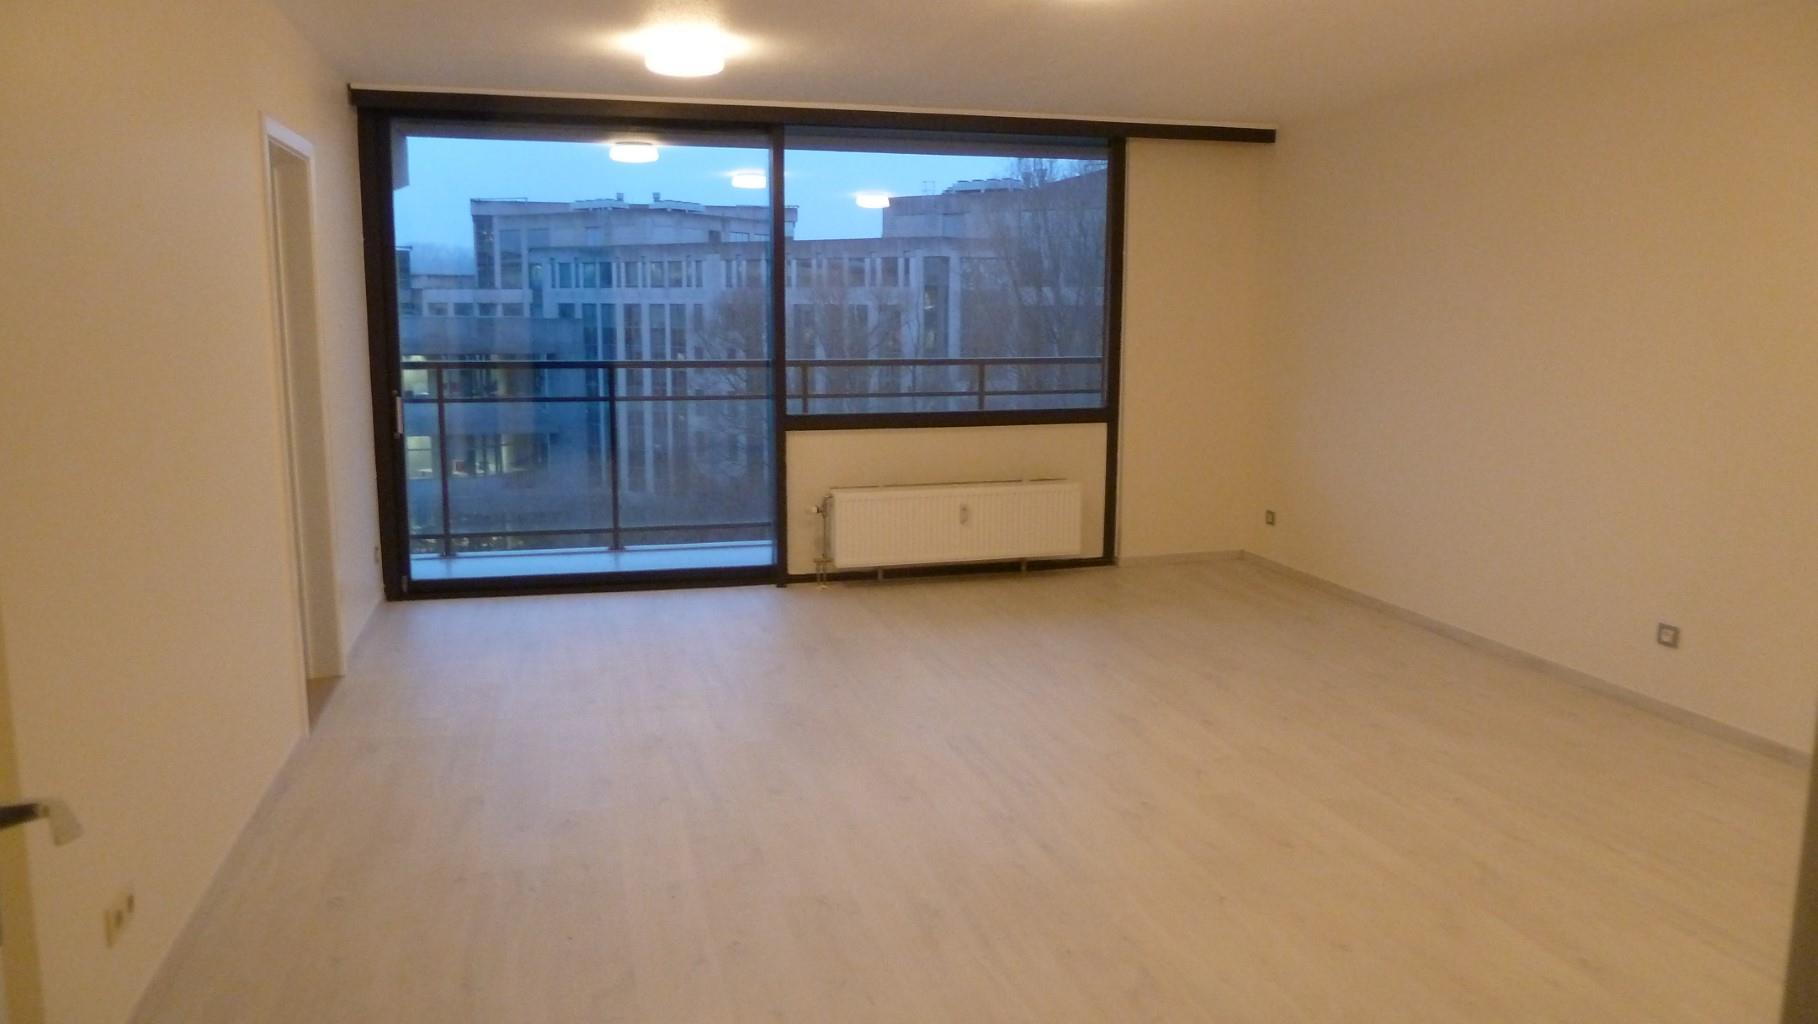 Appartement - Zaventem Sint-Stevens-Woluwe - #3970084-1